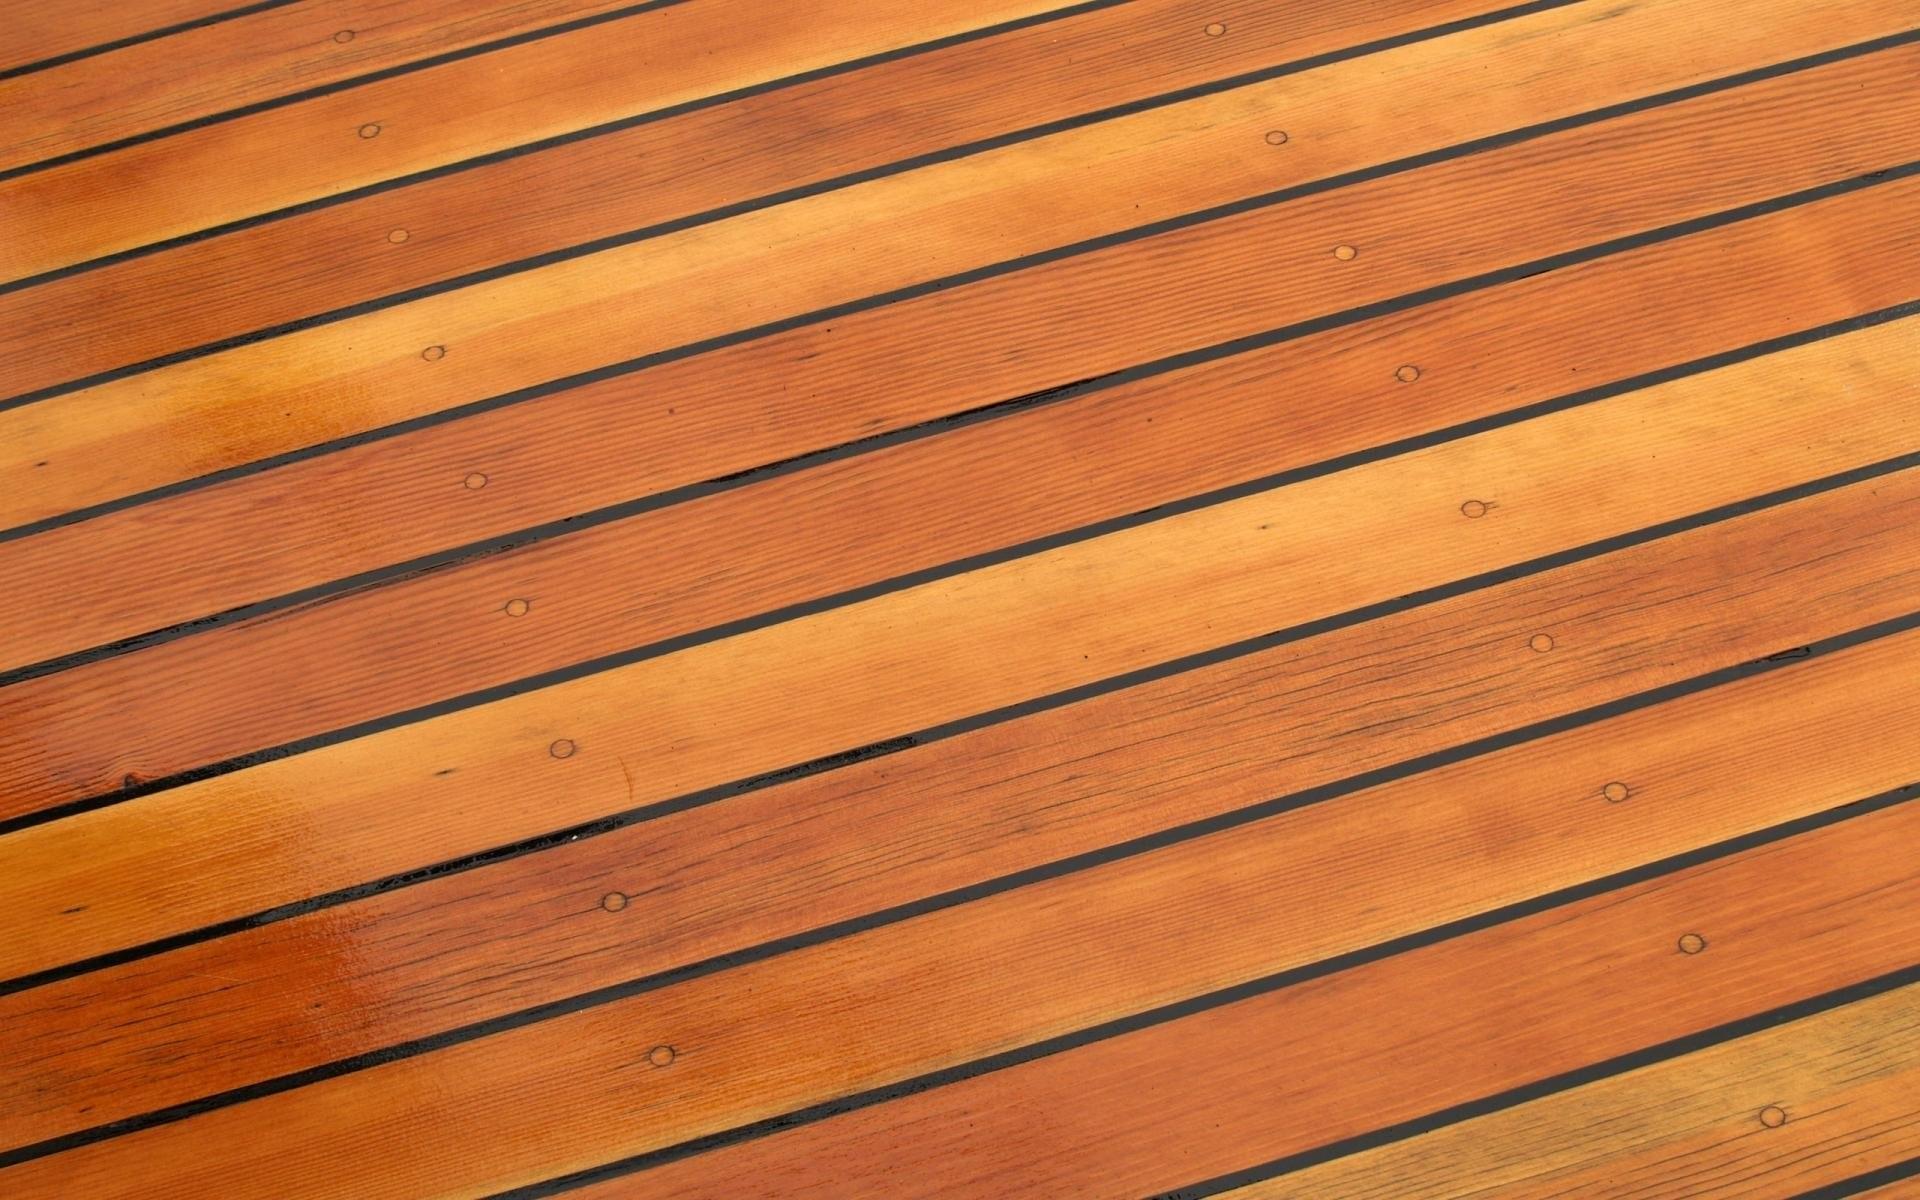 Wood Floor Patterns Wallpaper